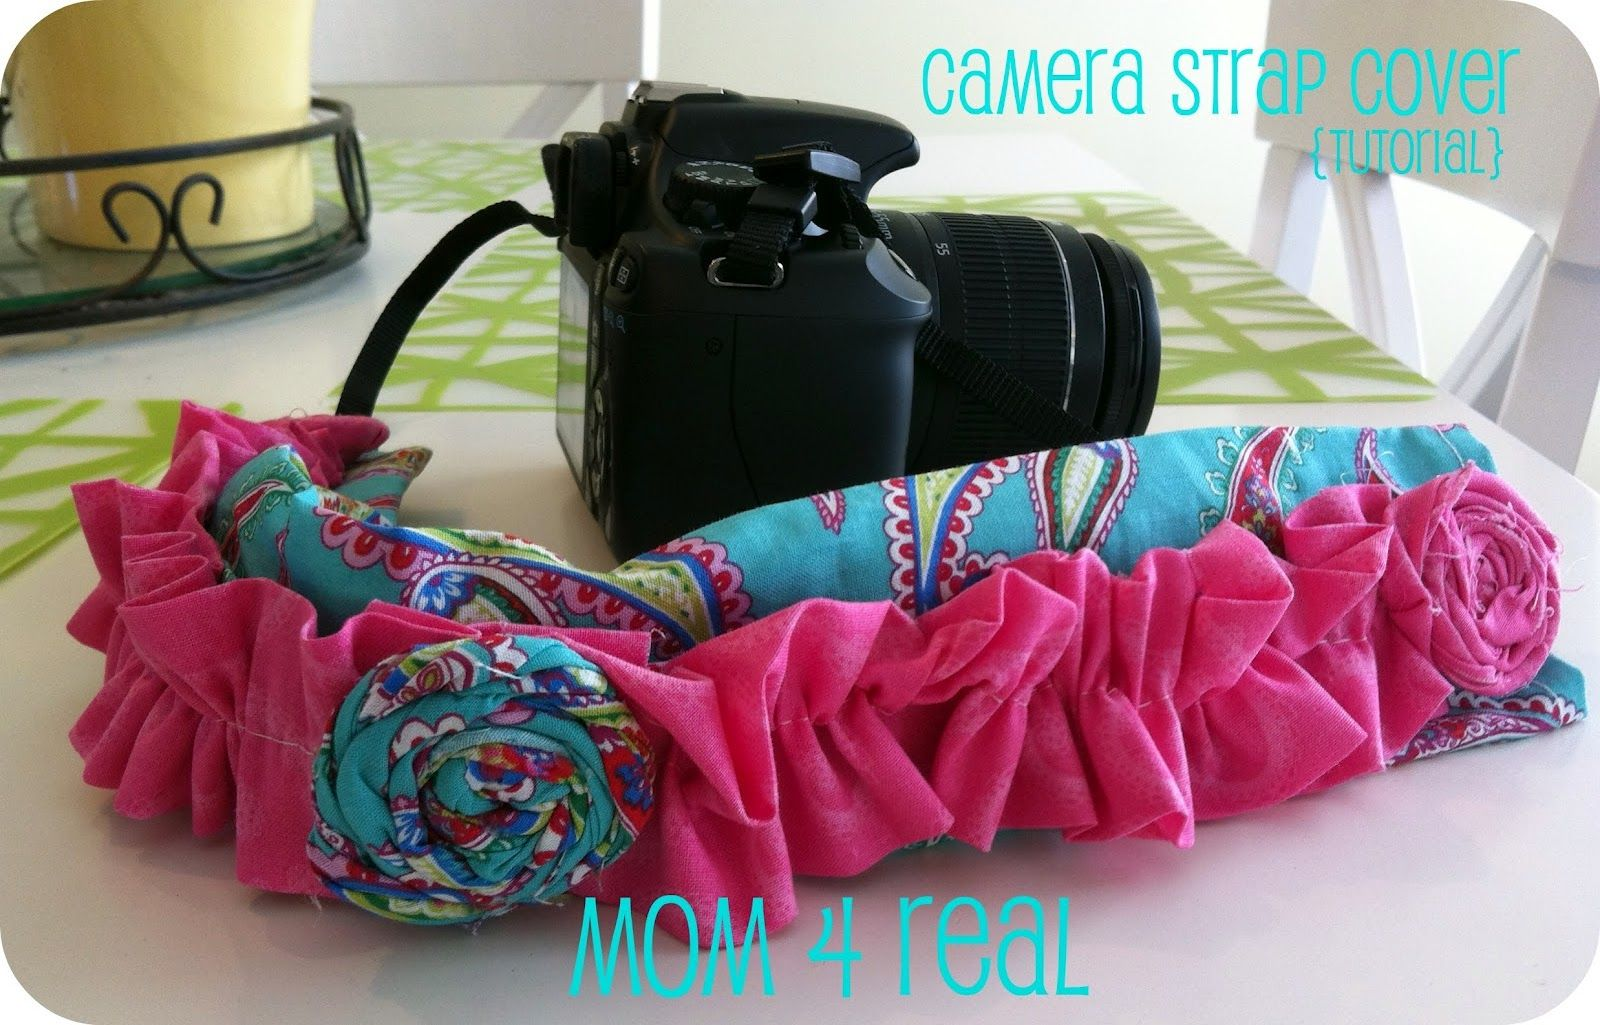 Camera Strap Cover {tutorial} - Mom 4 Real